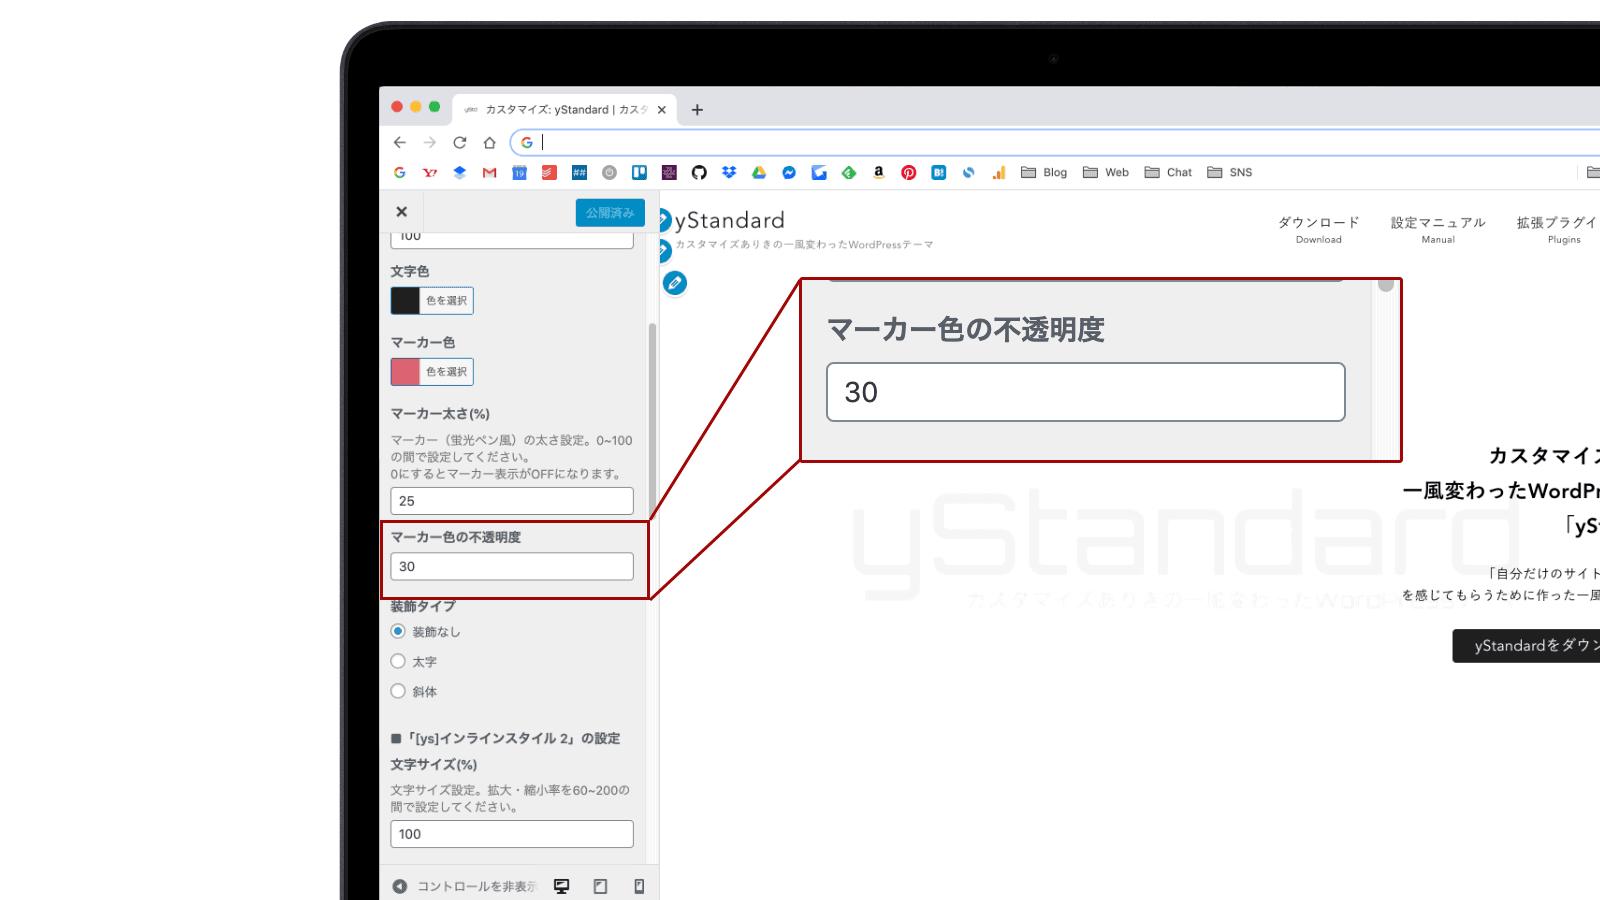 yStandard Blocksのマーカー不透明度設定追加